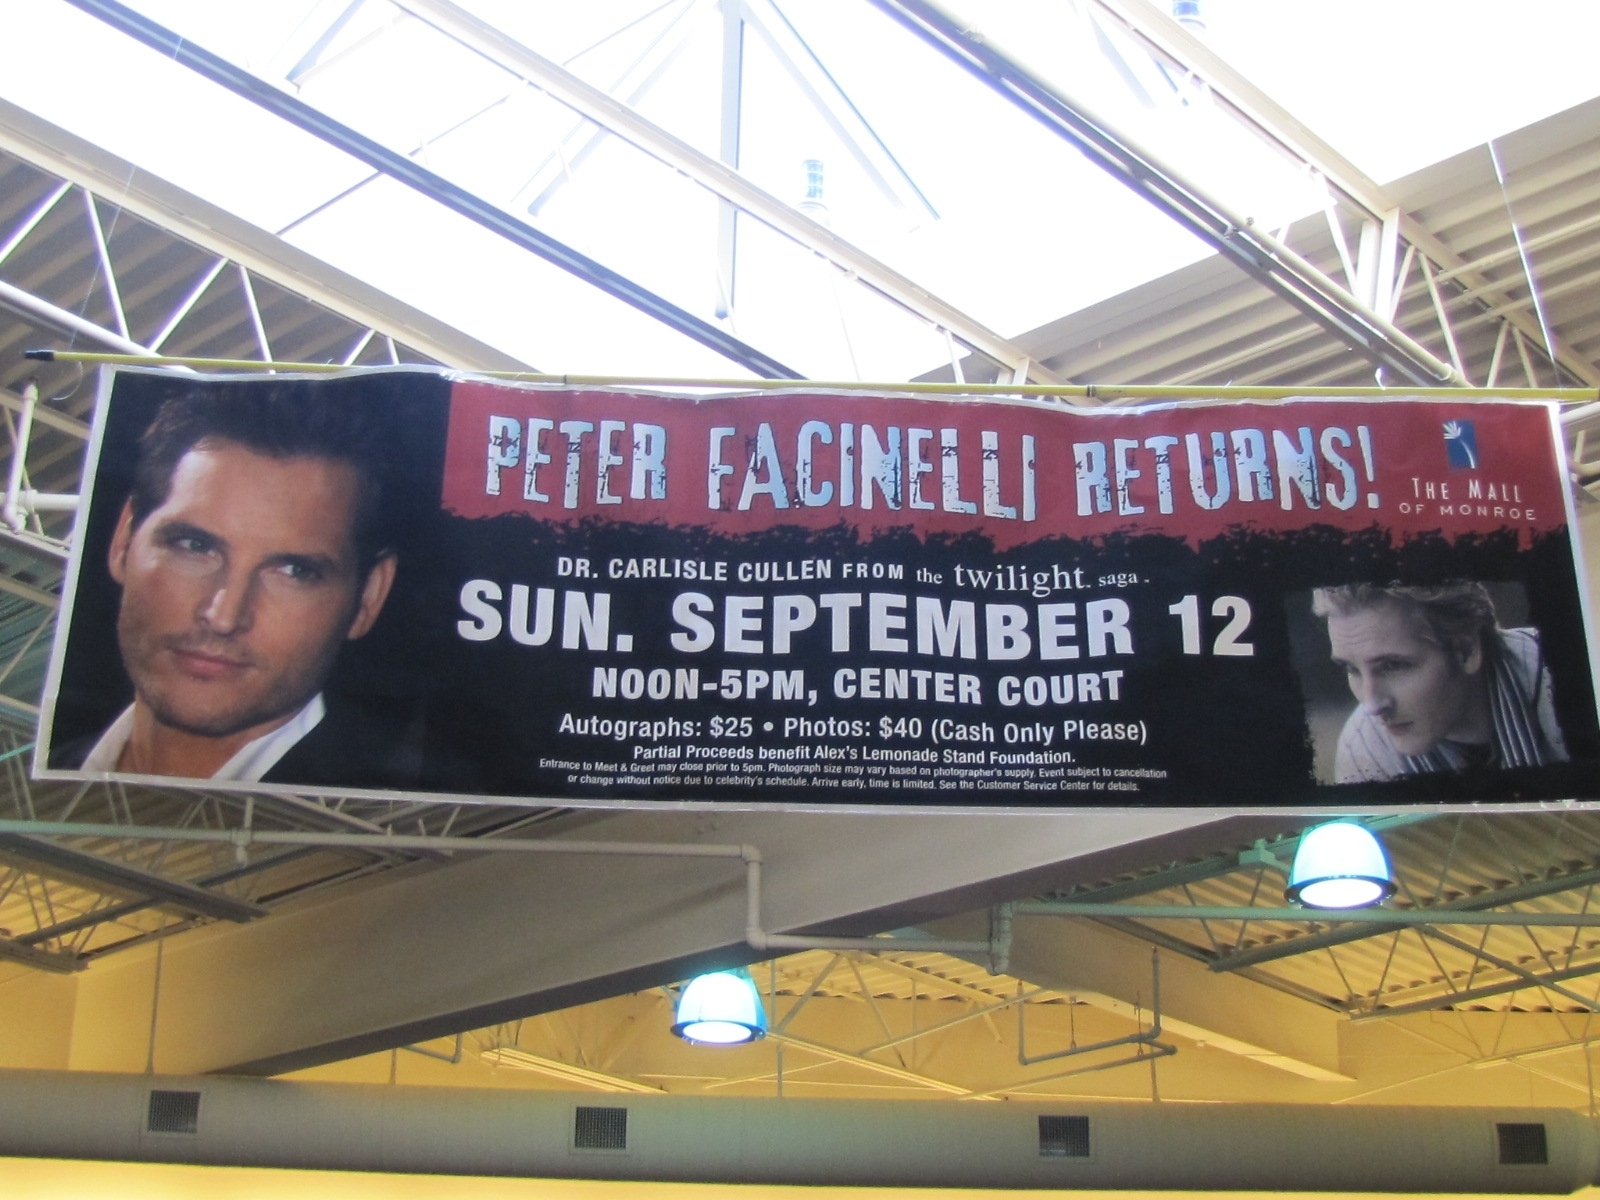 Peter Facinelli in Michigan